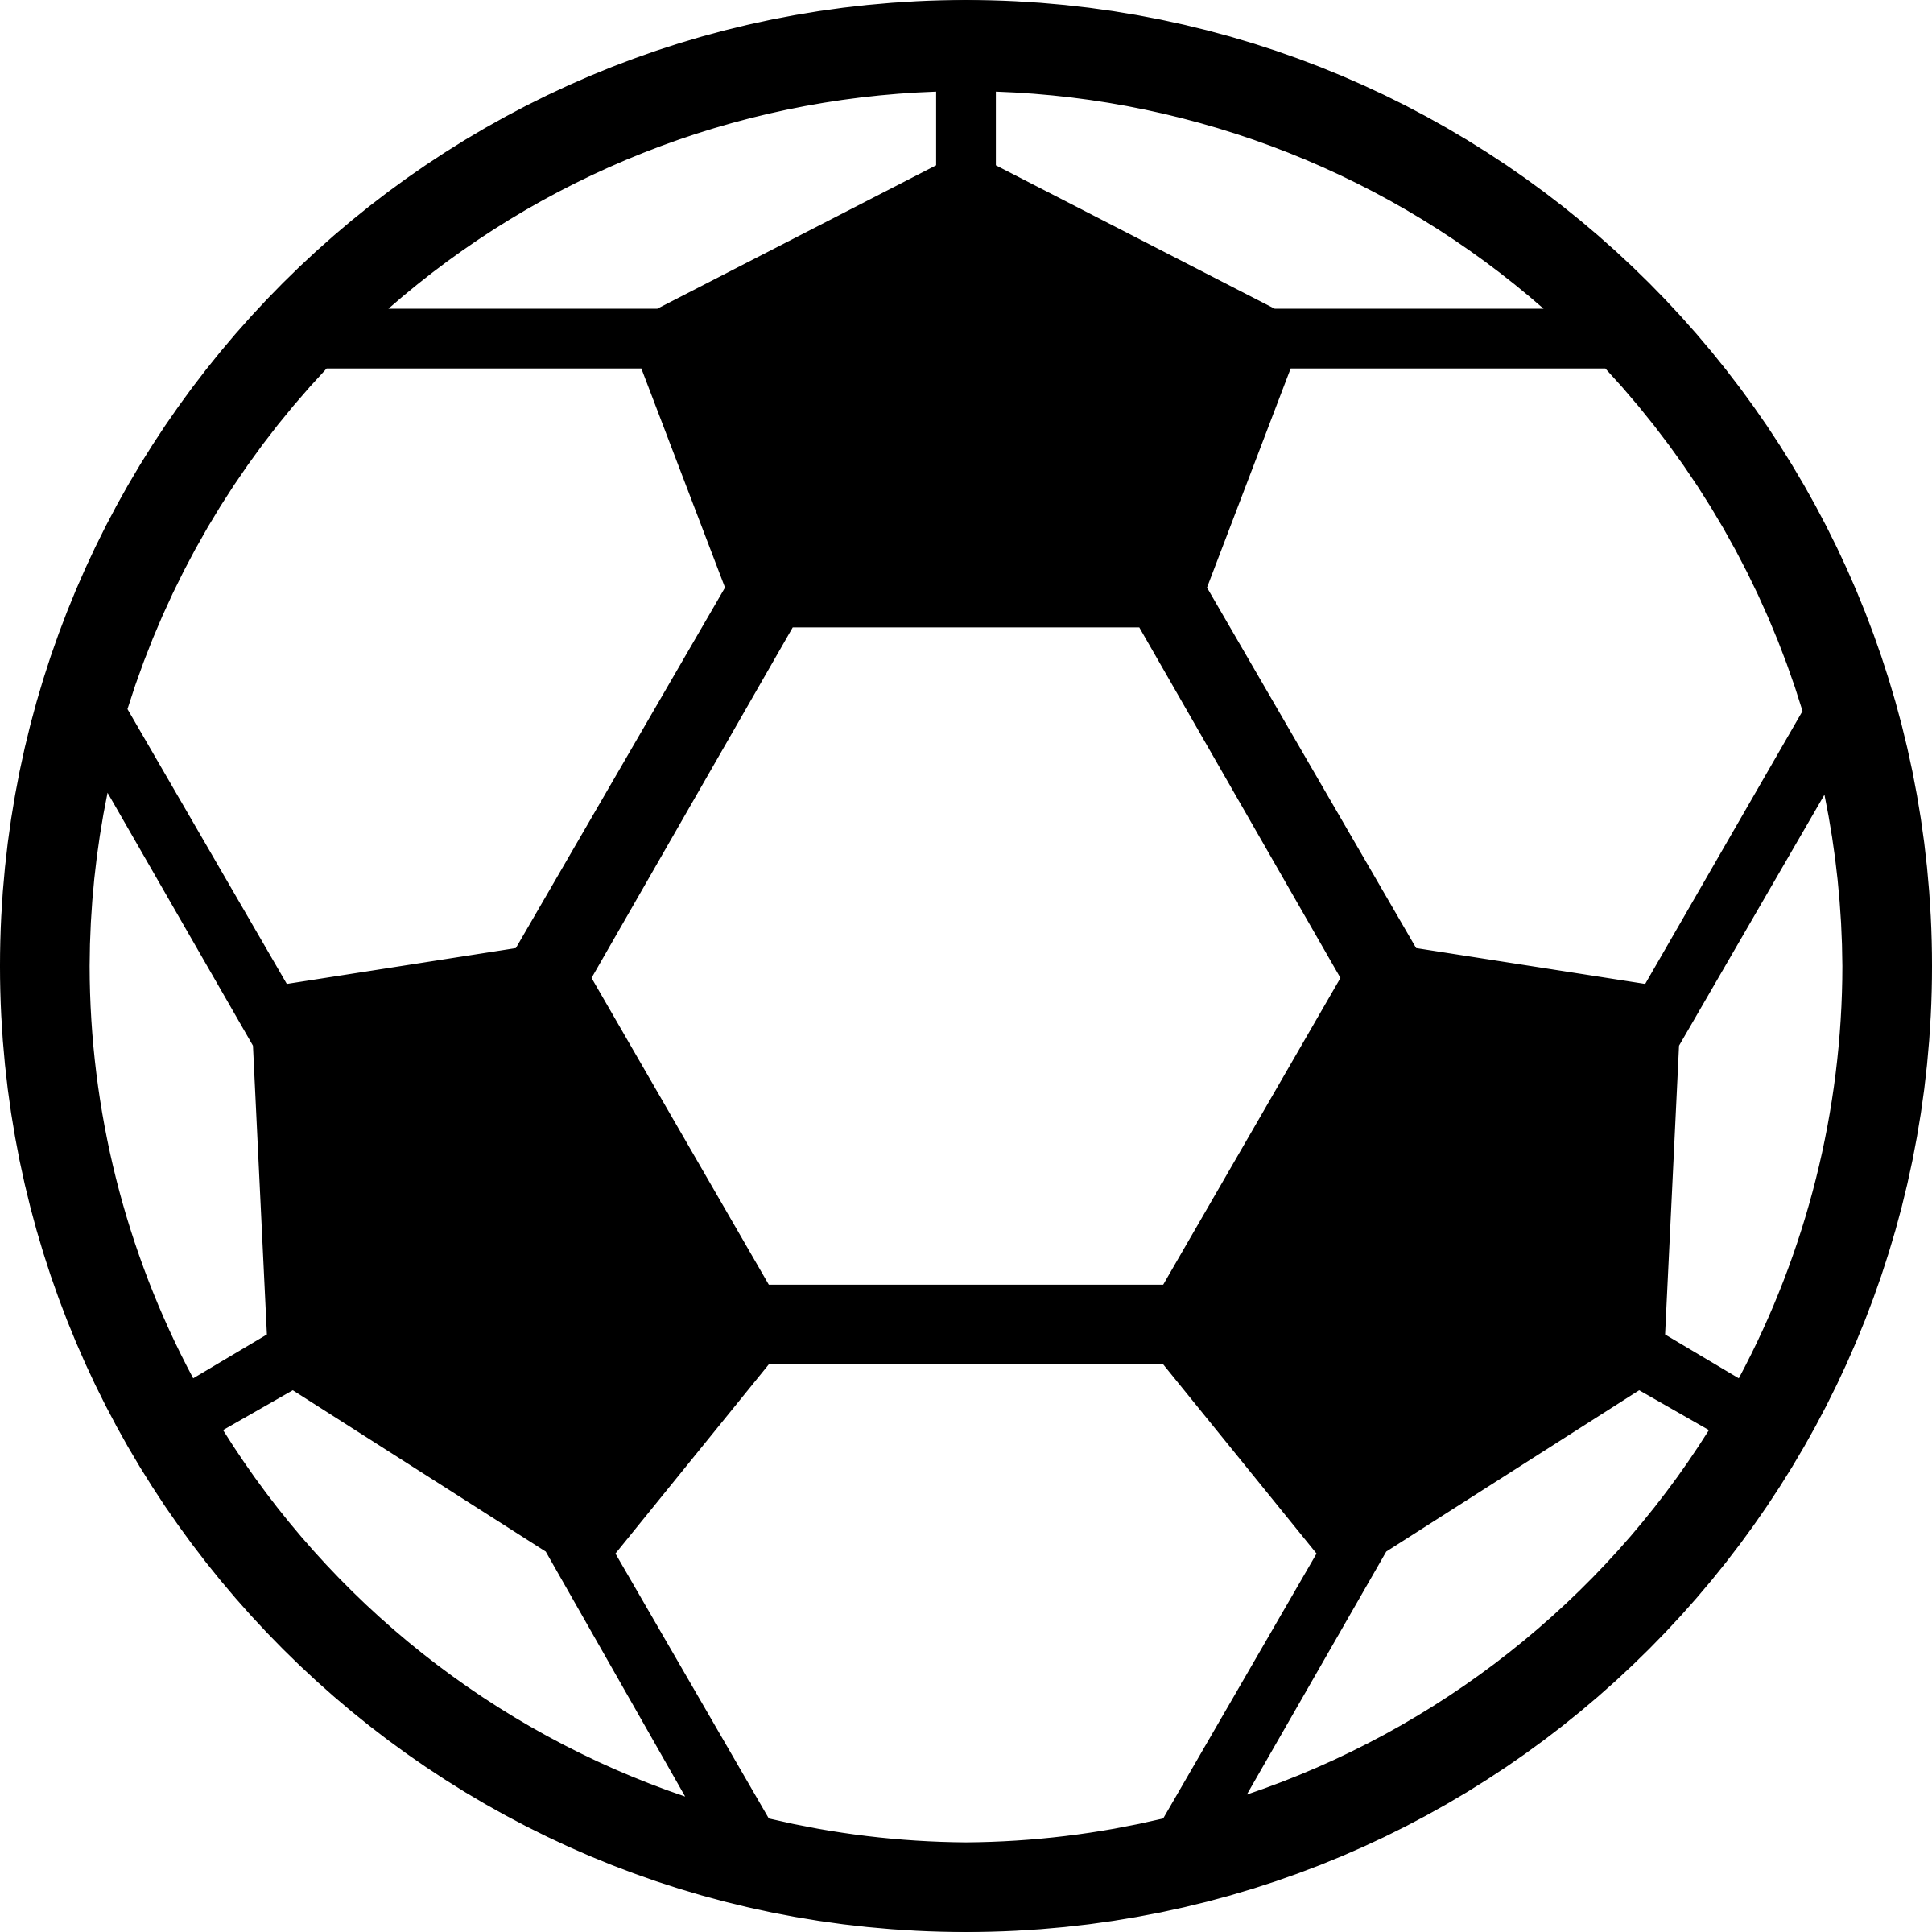 Soccer ball clip art 4